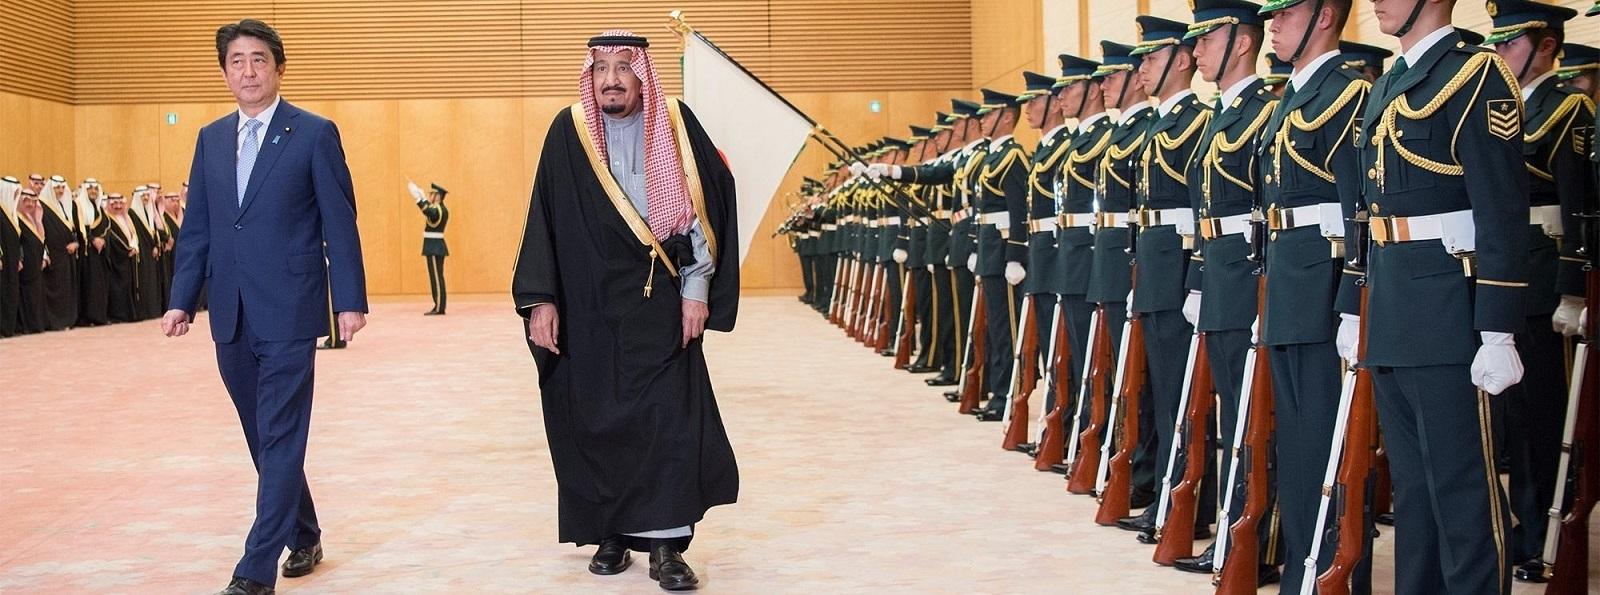 Japanese PM Shinzo Abe and Saudi King Salman bin Abdulaziz Al Saud in Tokyo on Monday (Photo by Bandar Algaloud / Saudi Crown/Handout/Getty Images)